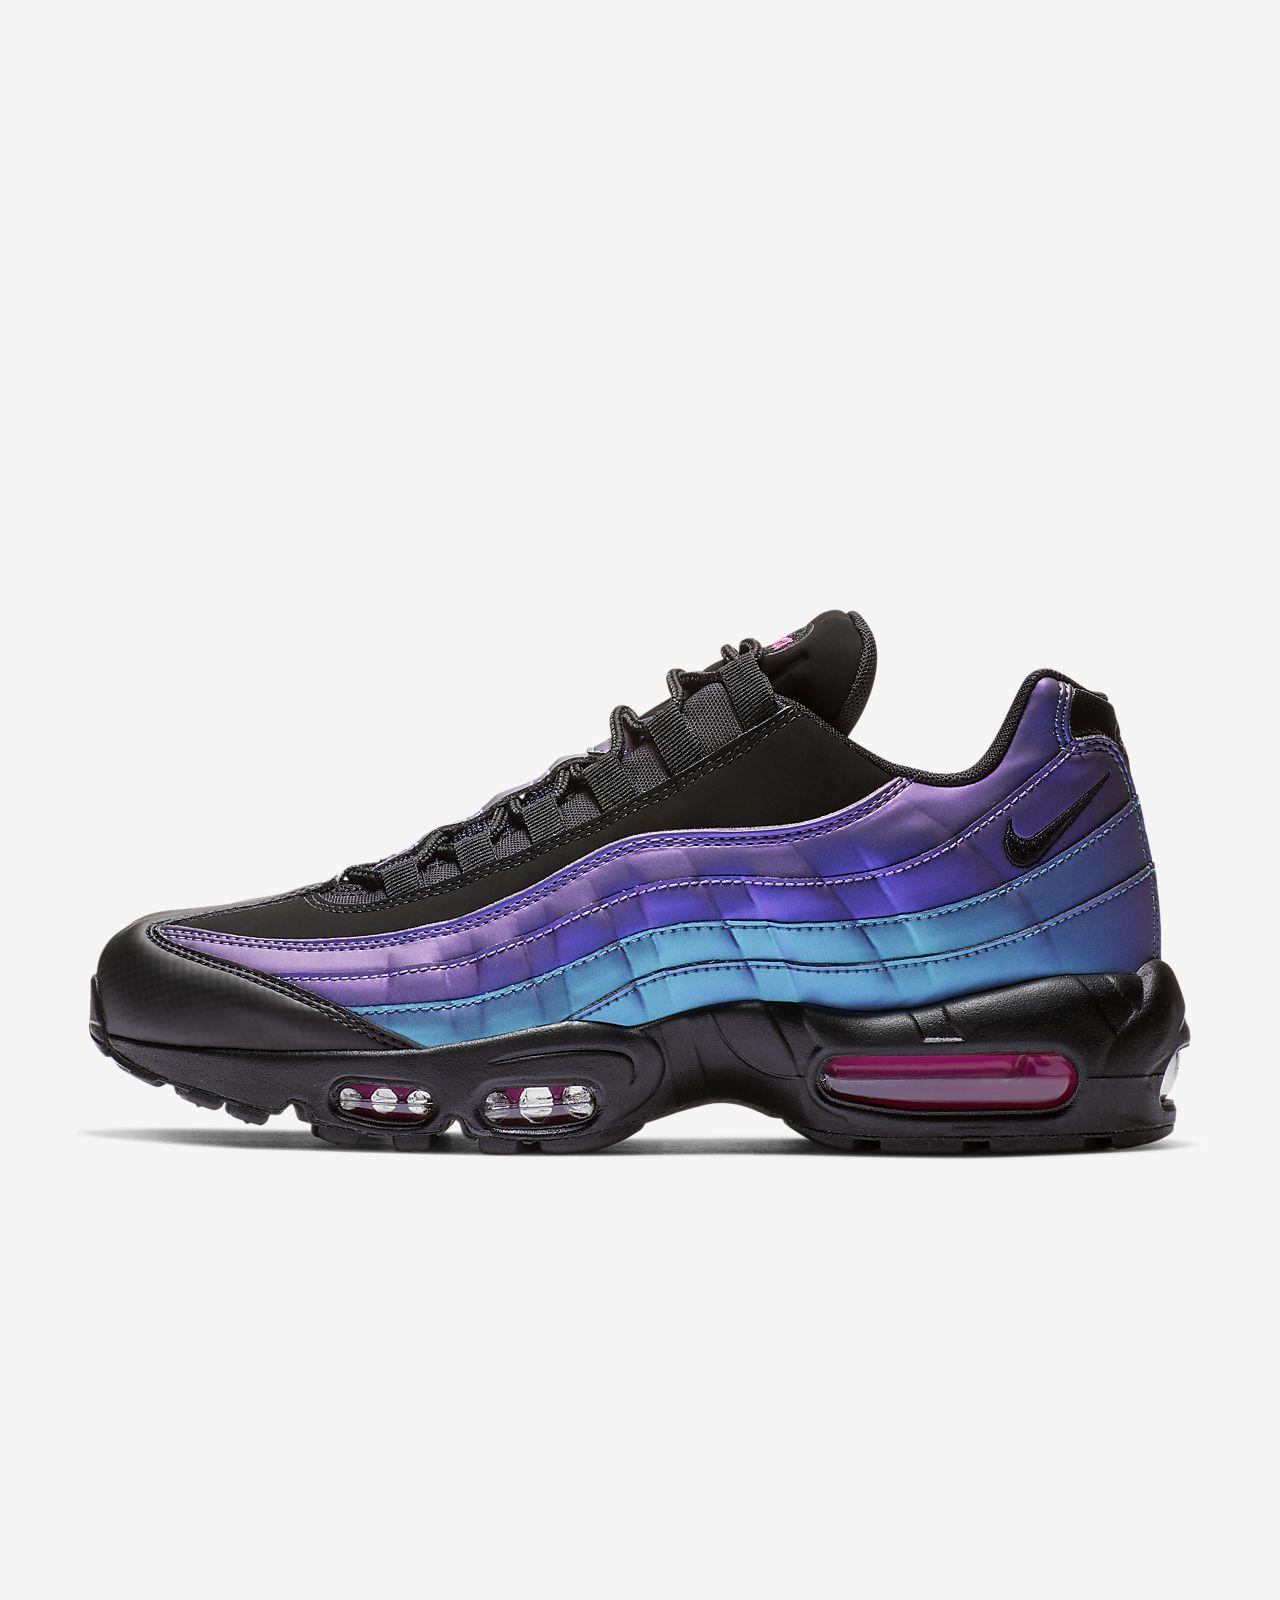 1522c98c Мужские кроссовки Nike Air Max 95 Premium. Nike.com RU